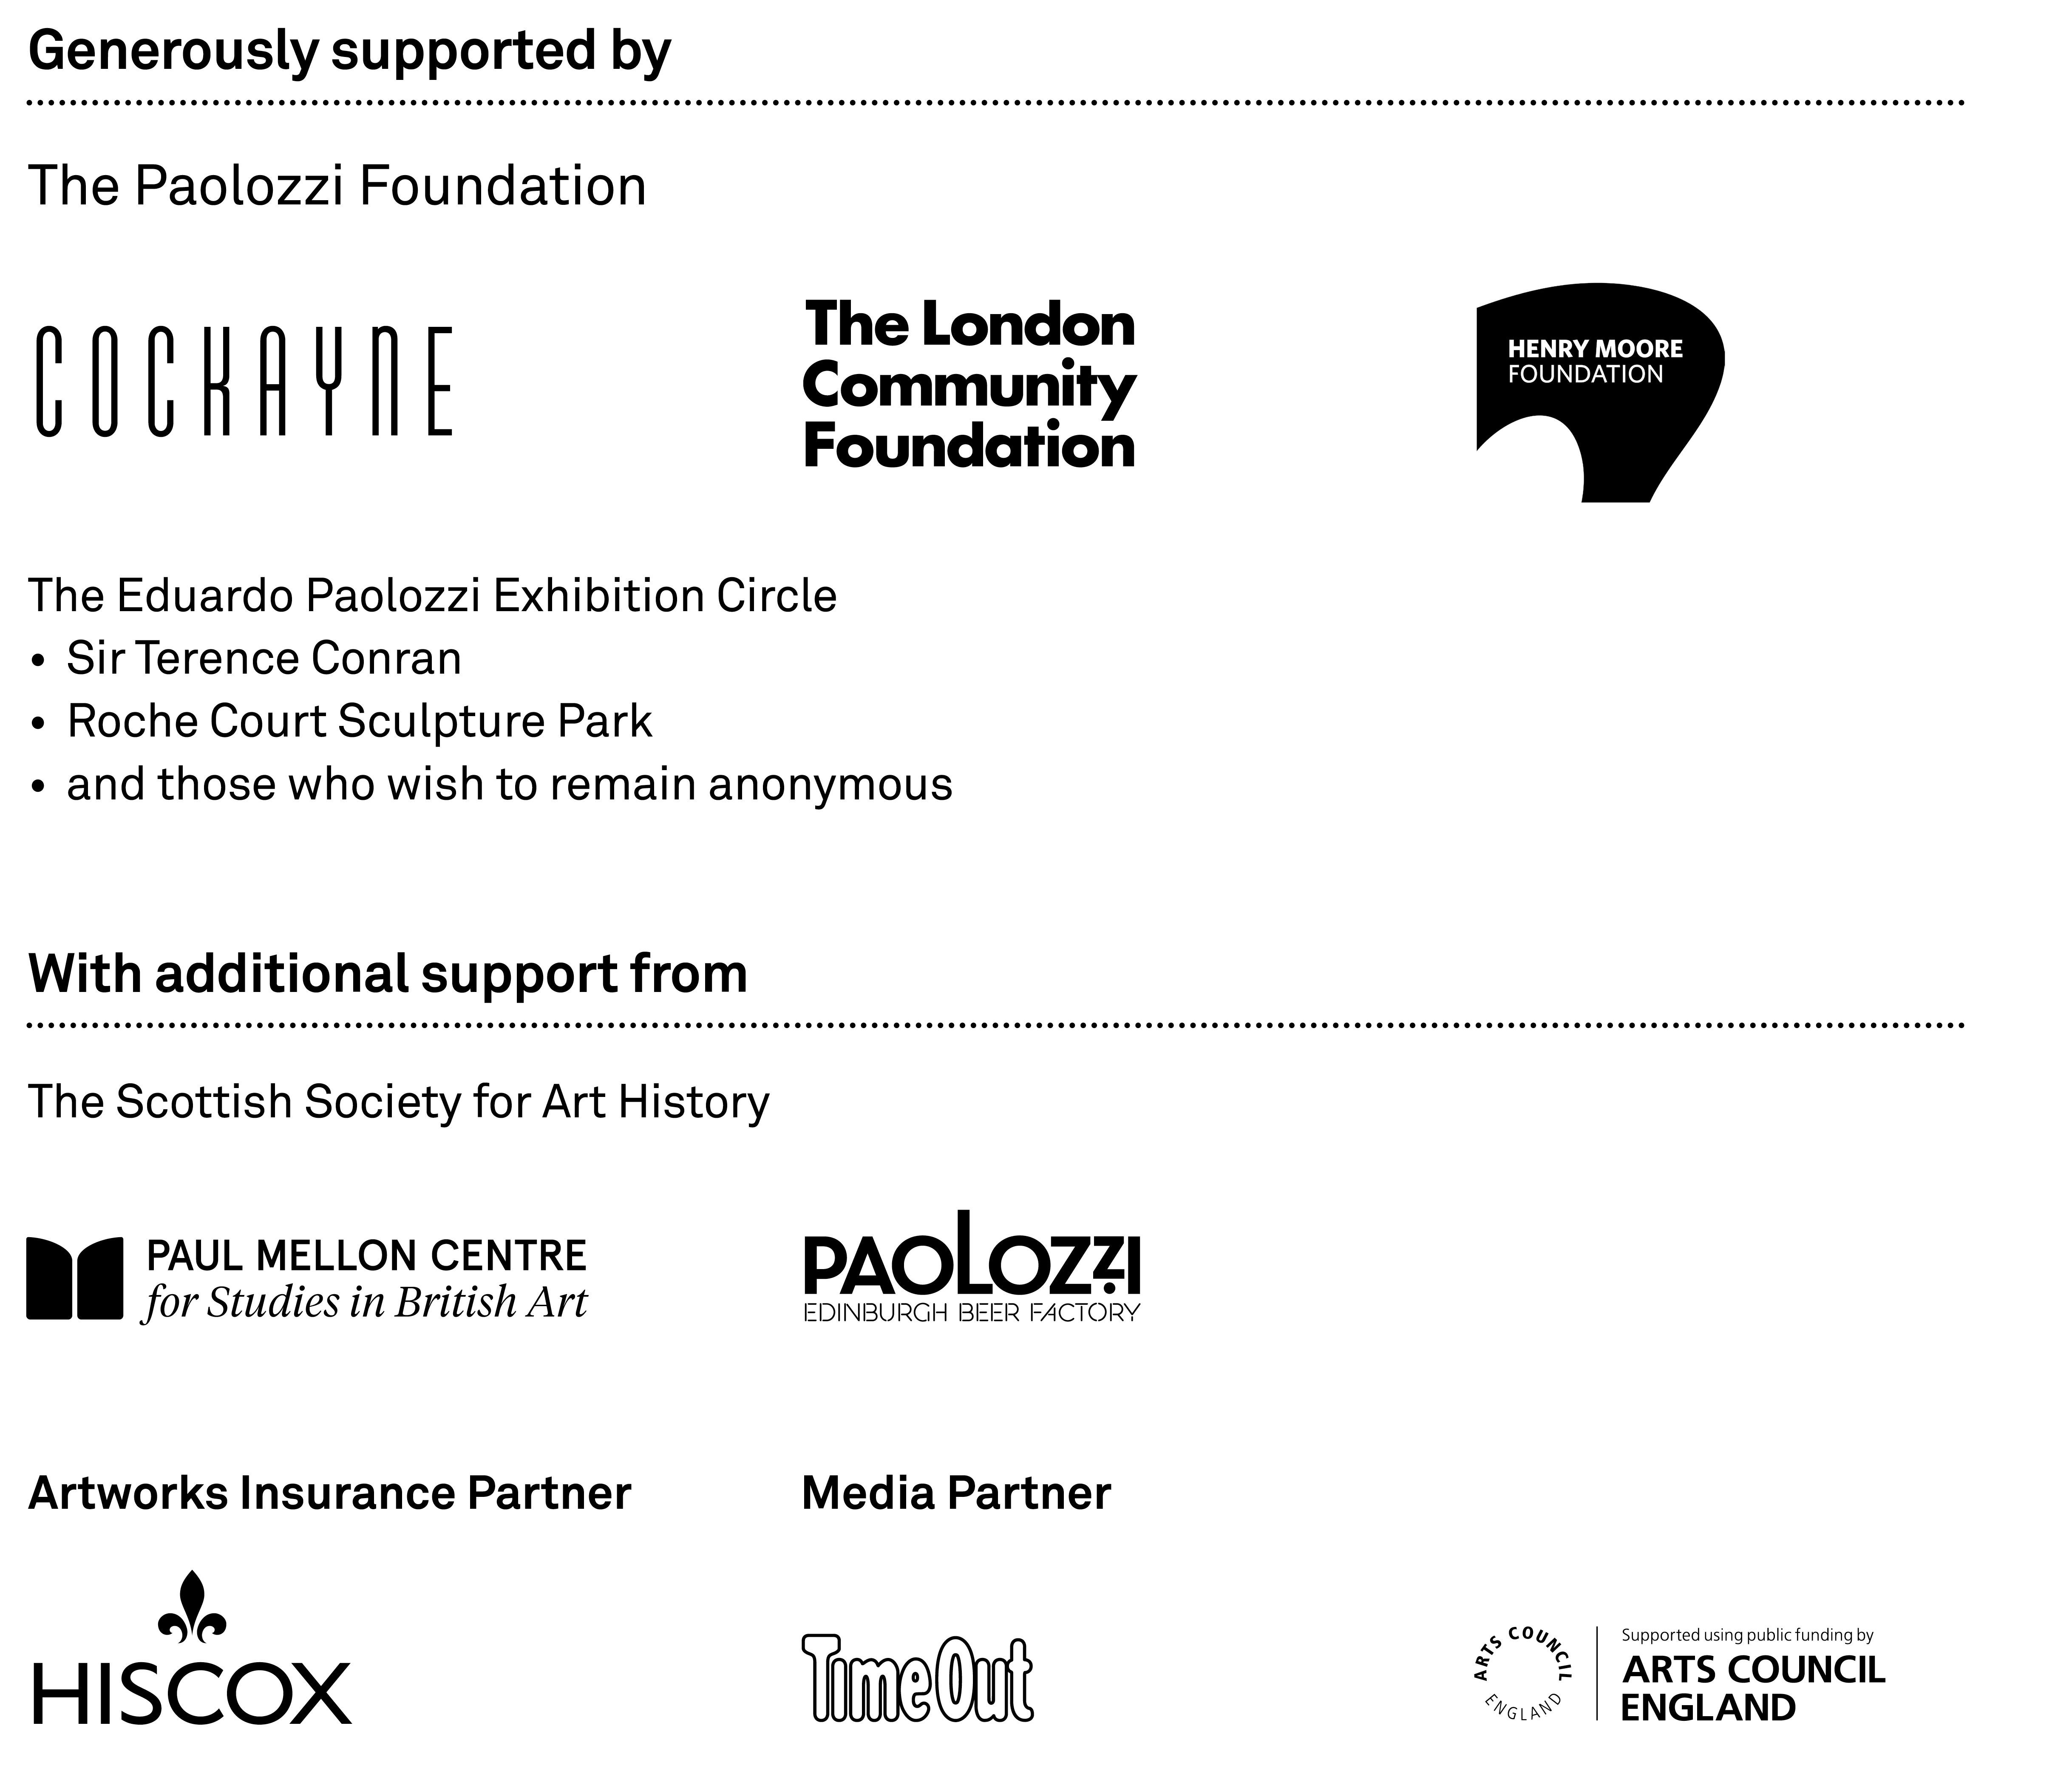 Eduardo Paolozzi at Whitechapel Gallery, Media Partners & Sponsors